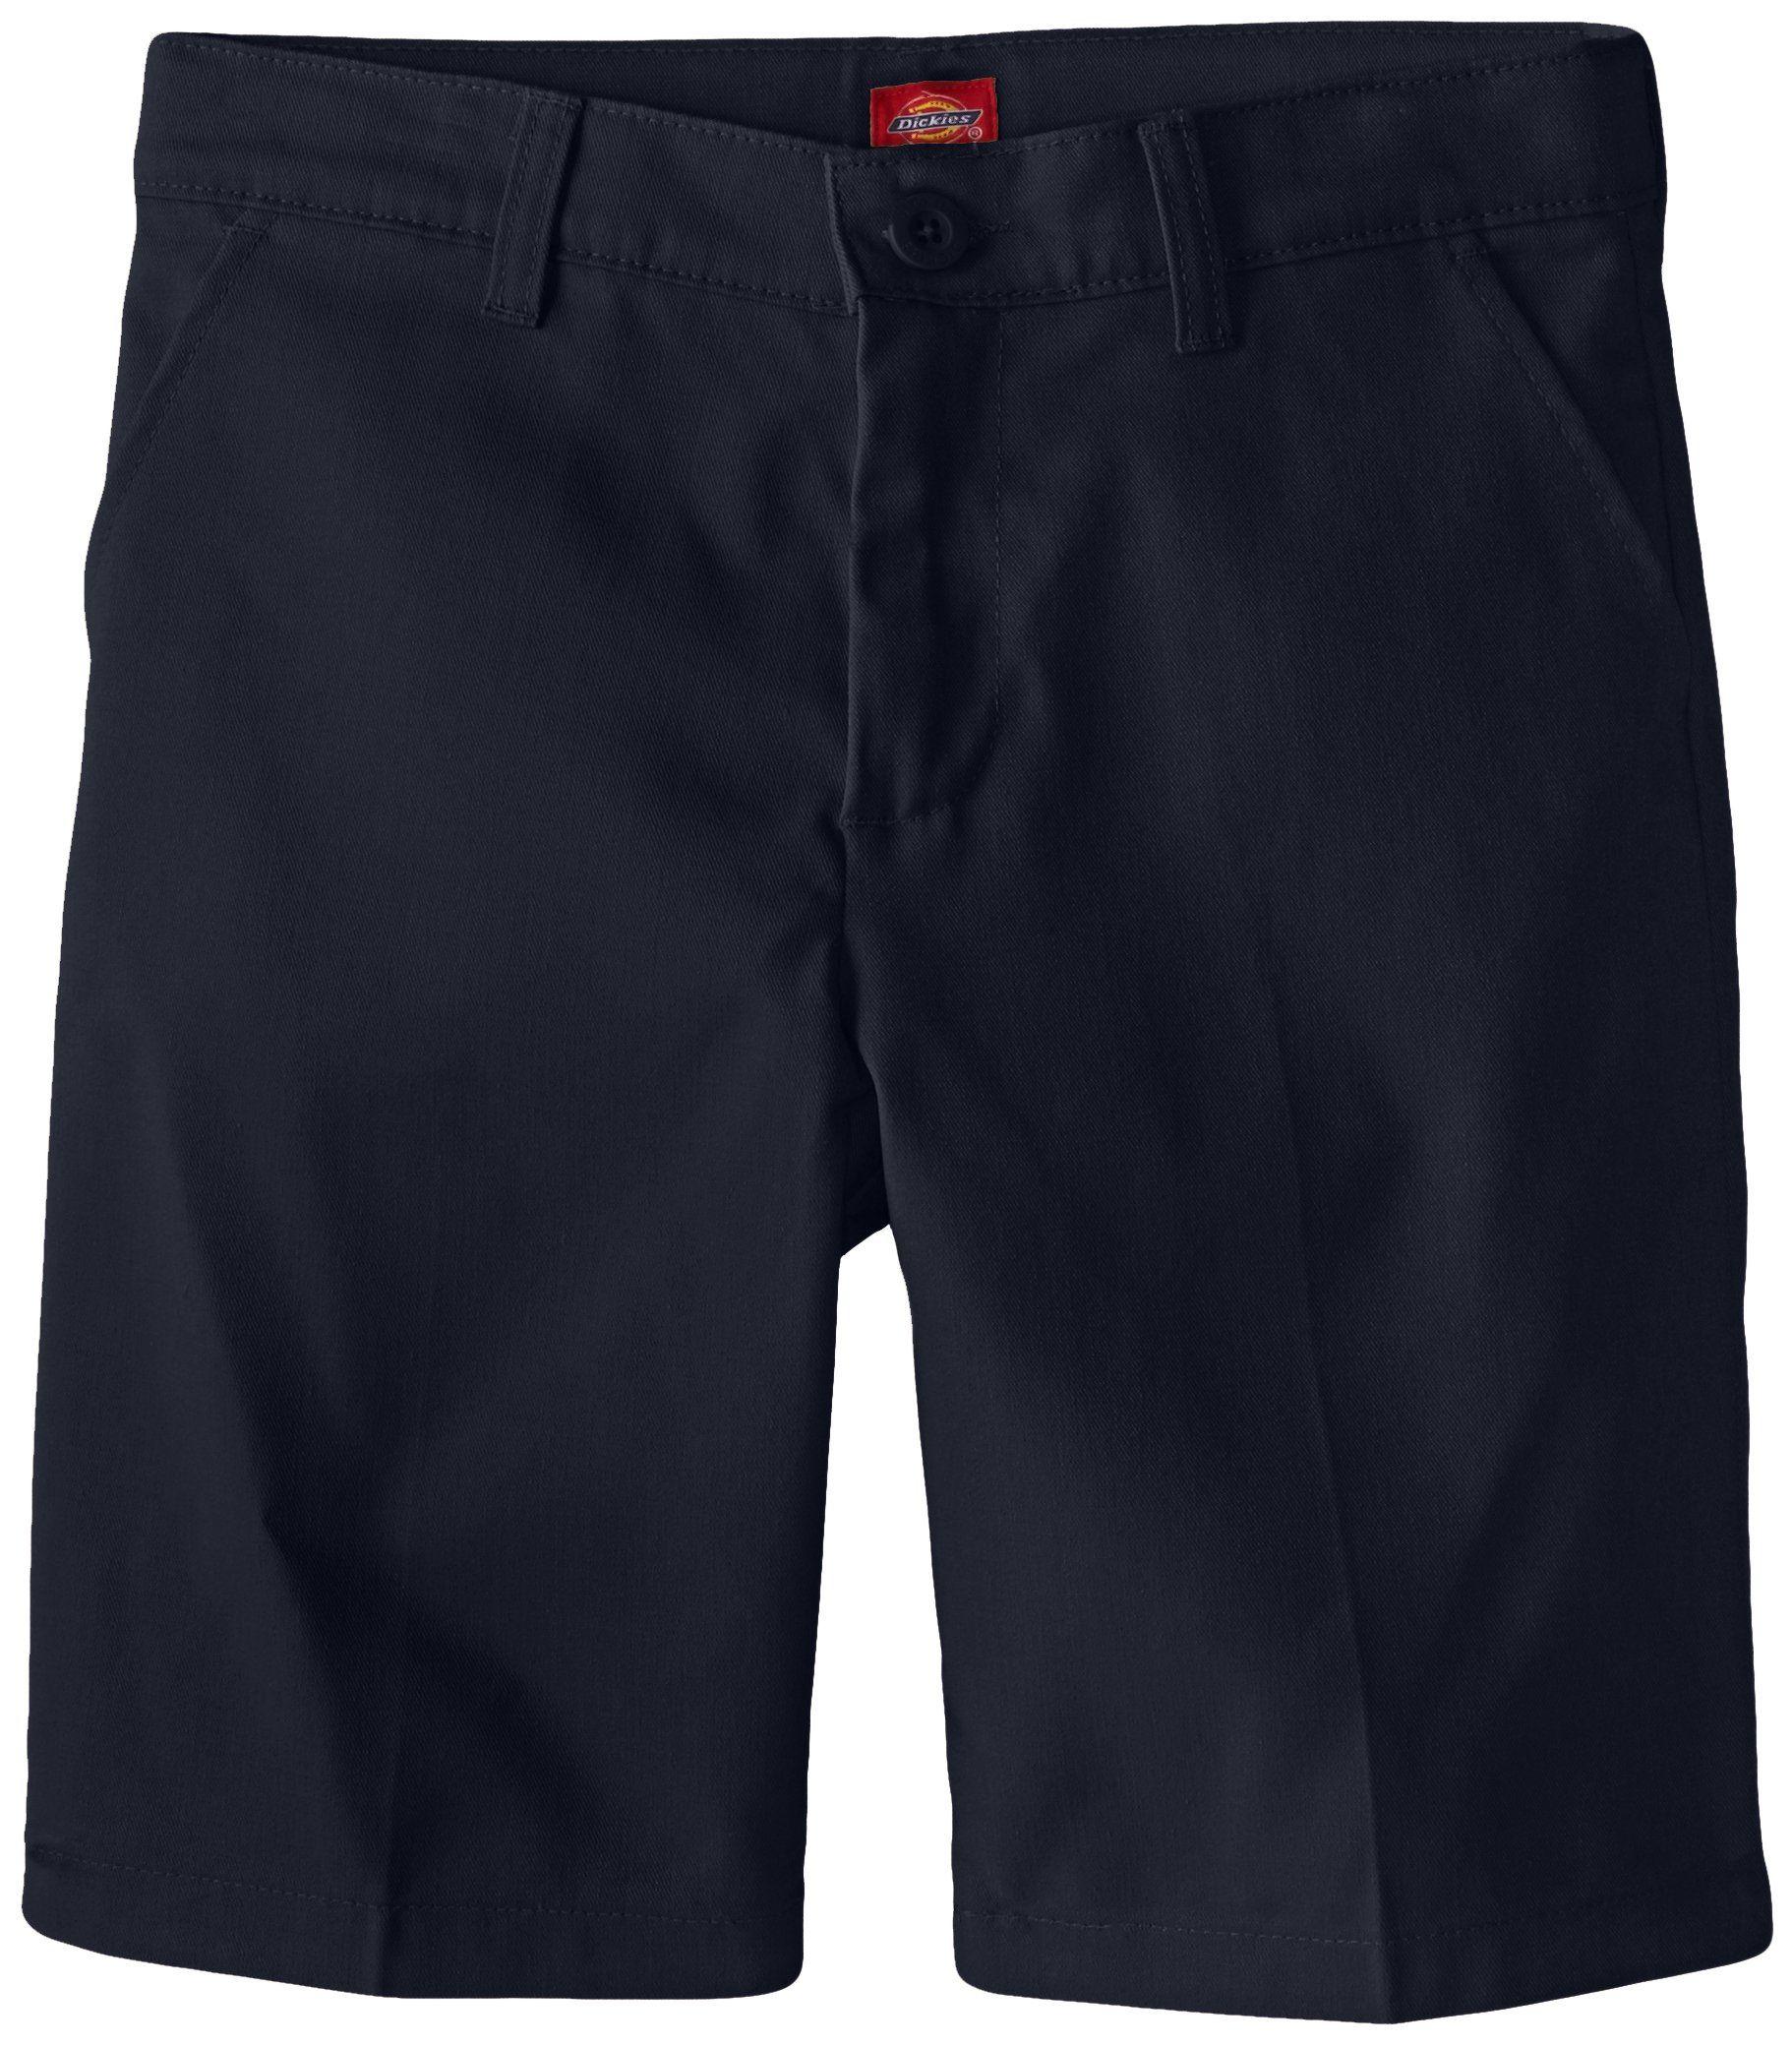 Dickies Girl Big Girls' Flex Waist Slim Fit Flat Front Short, Dark Navy, 12